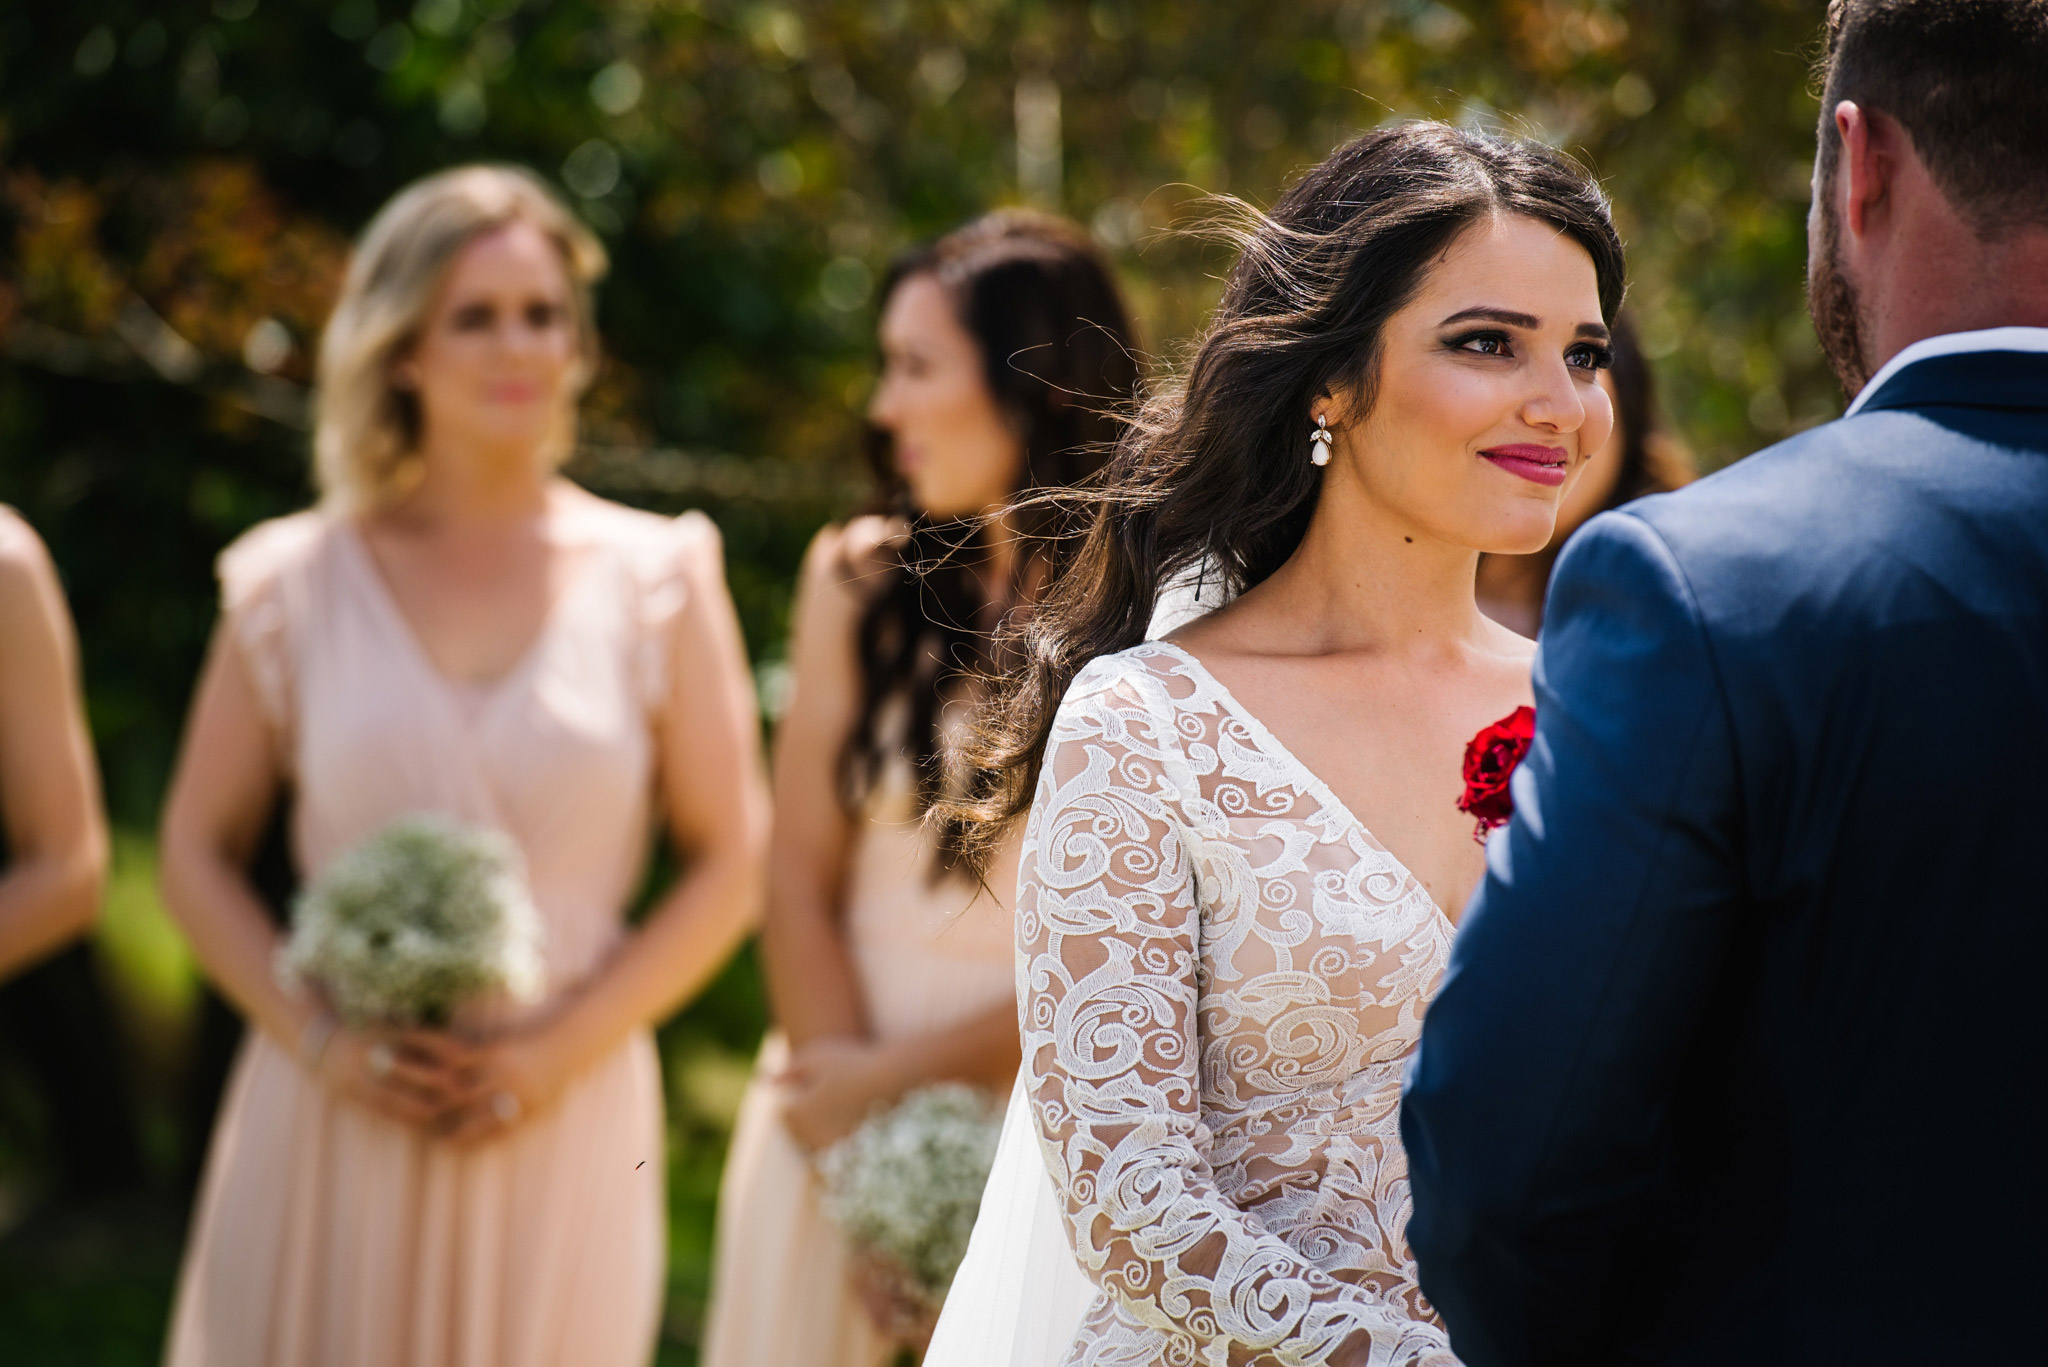 Vows-at-Hawkesbury-River-wedding-ceremony.jpg